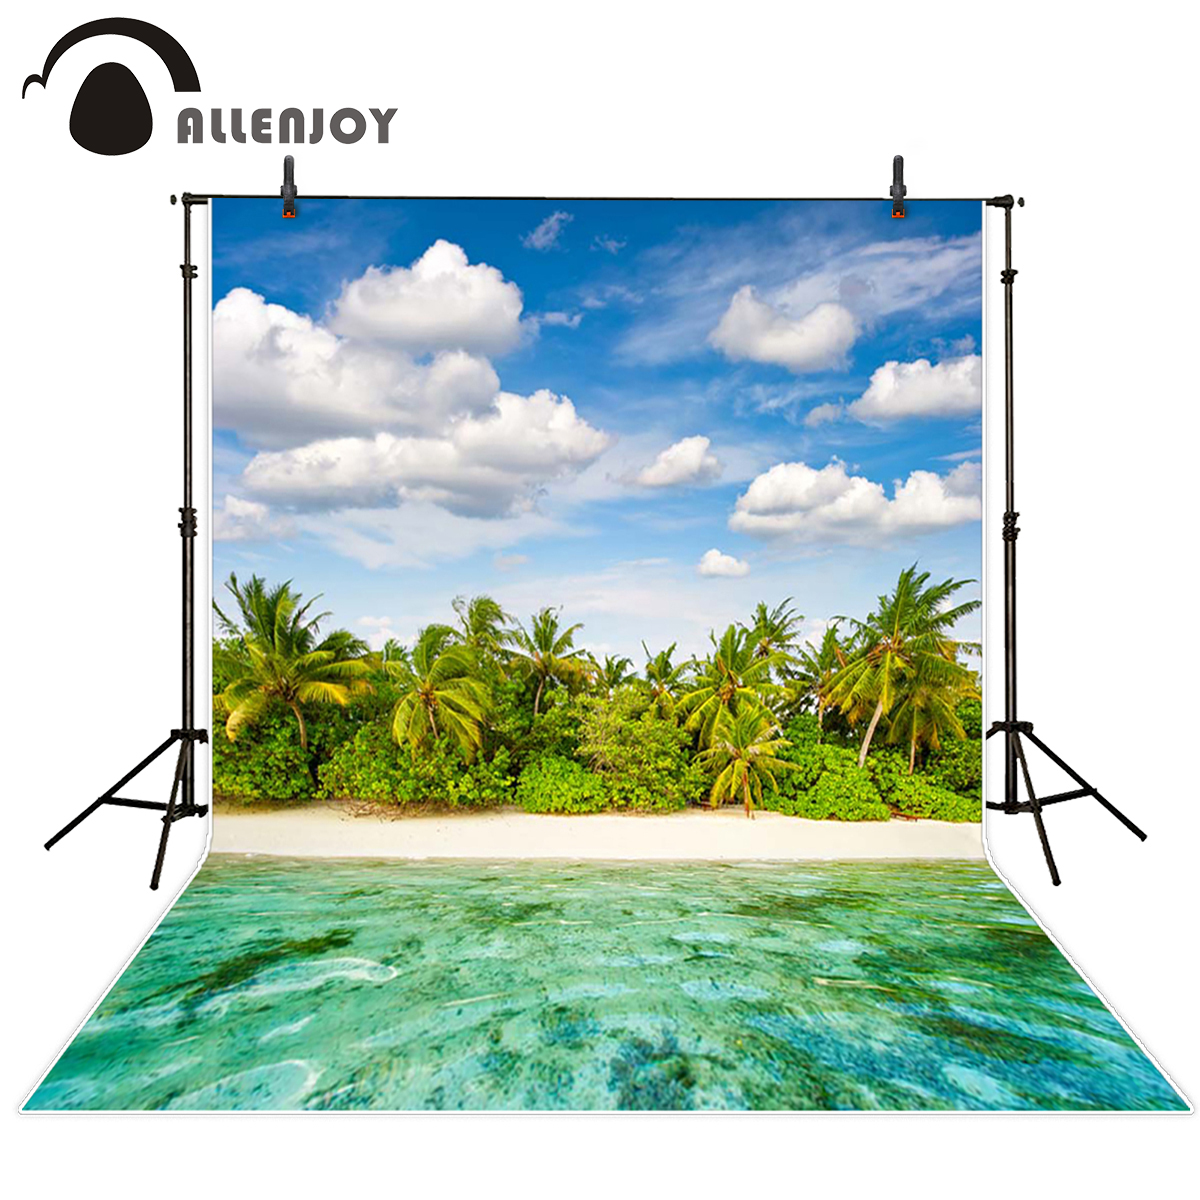 Allenjoy scenery photo backdrop Island coconut tree clouds beach photocall studio background For a photo shoot vinyl cloth allenjoy vinyl photo studio background football game backdrop picture children s photocall